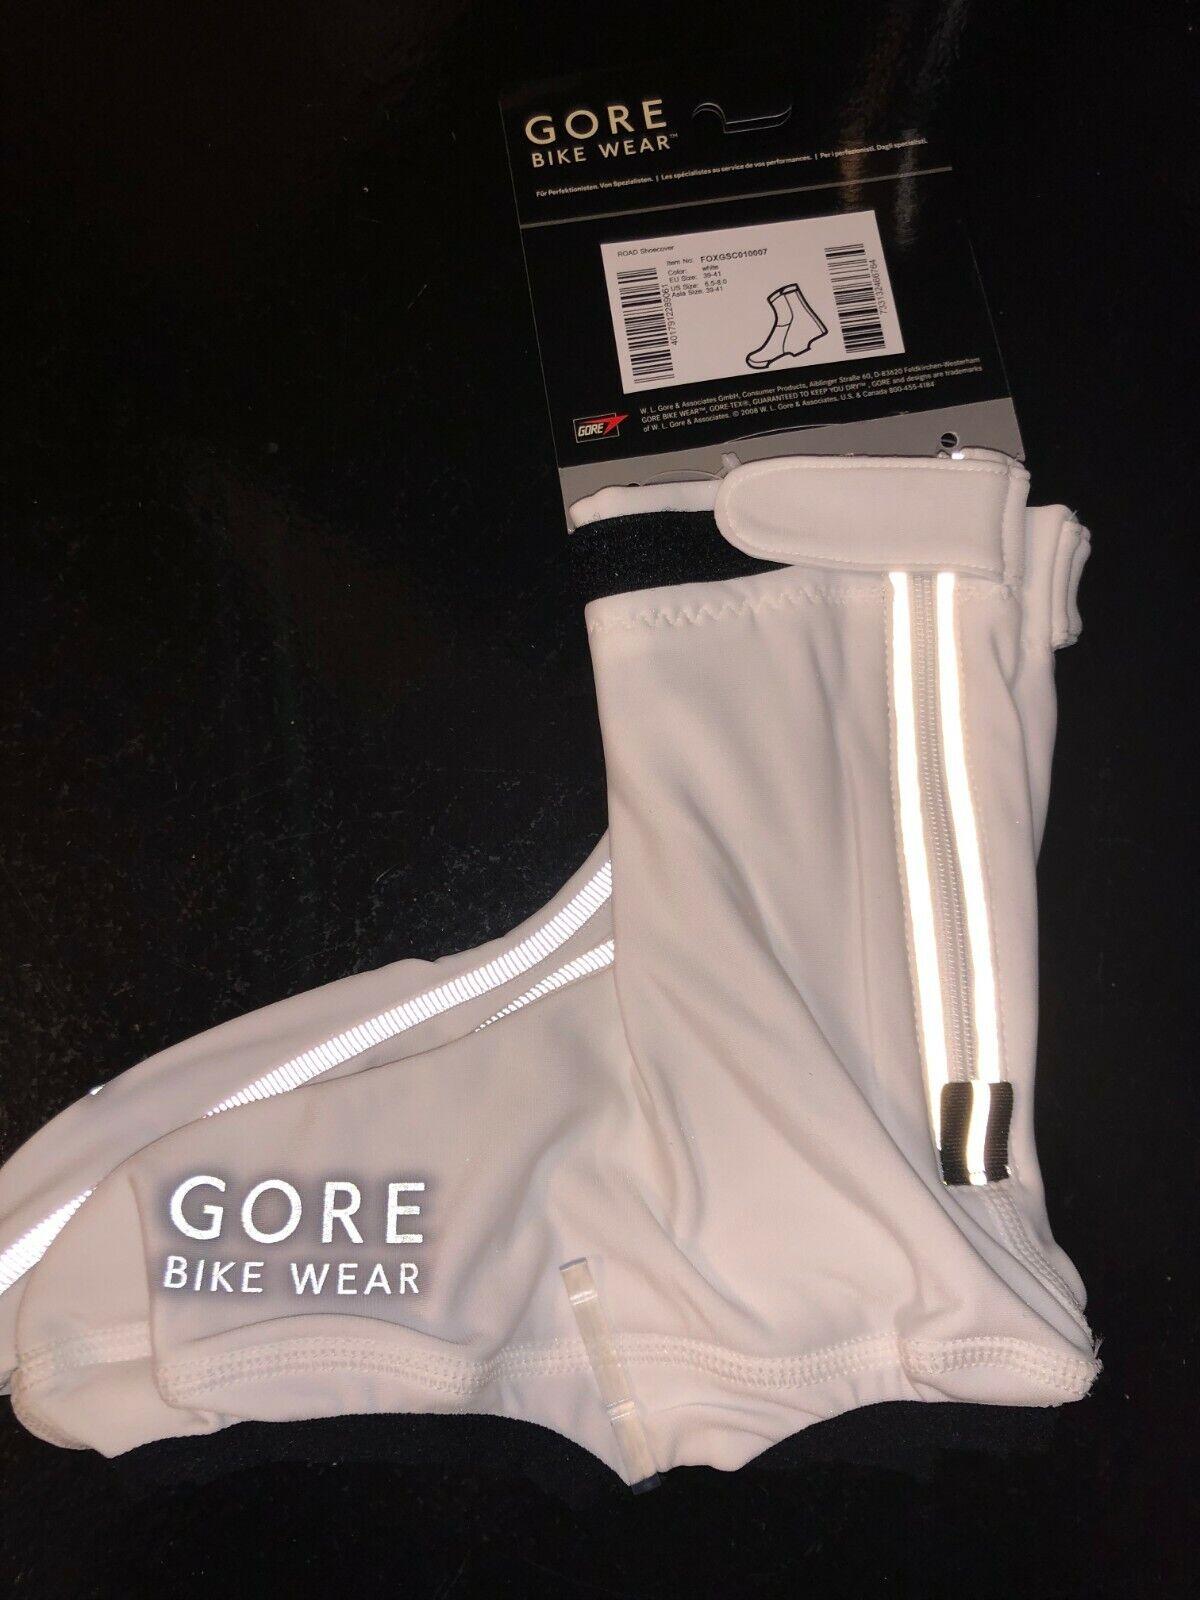 GORE BIKE WEAR - Oxygen road overshoes, lightweight, reflective, white